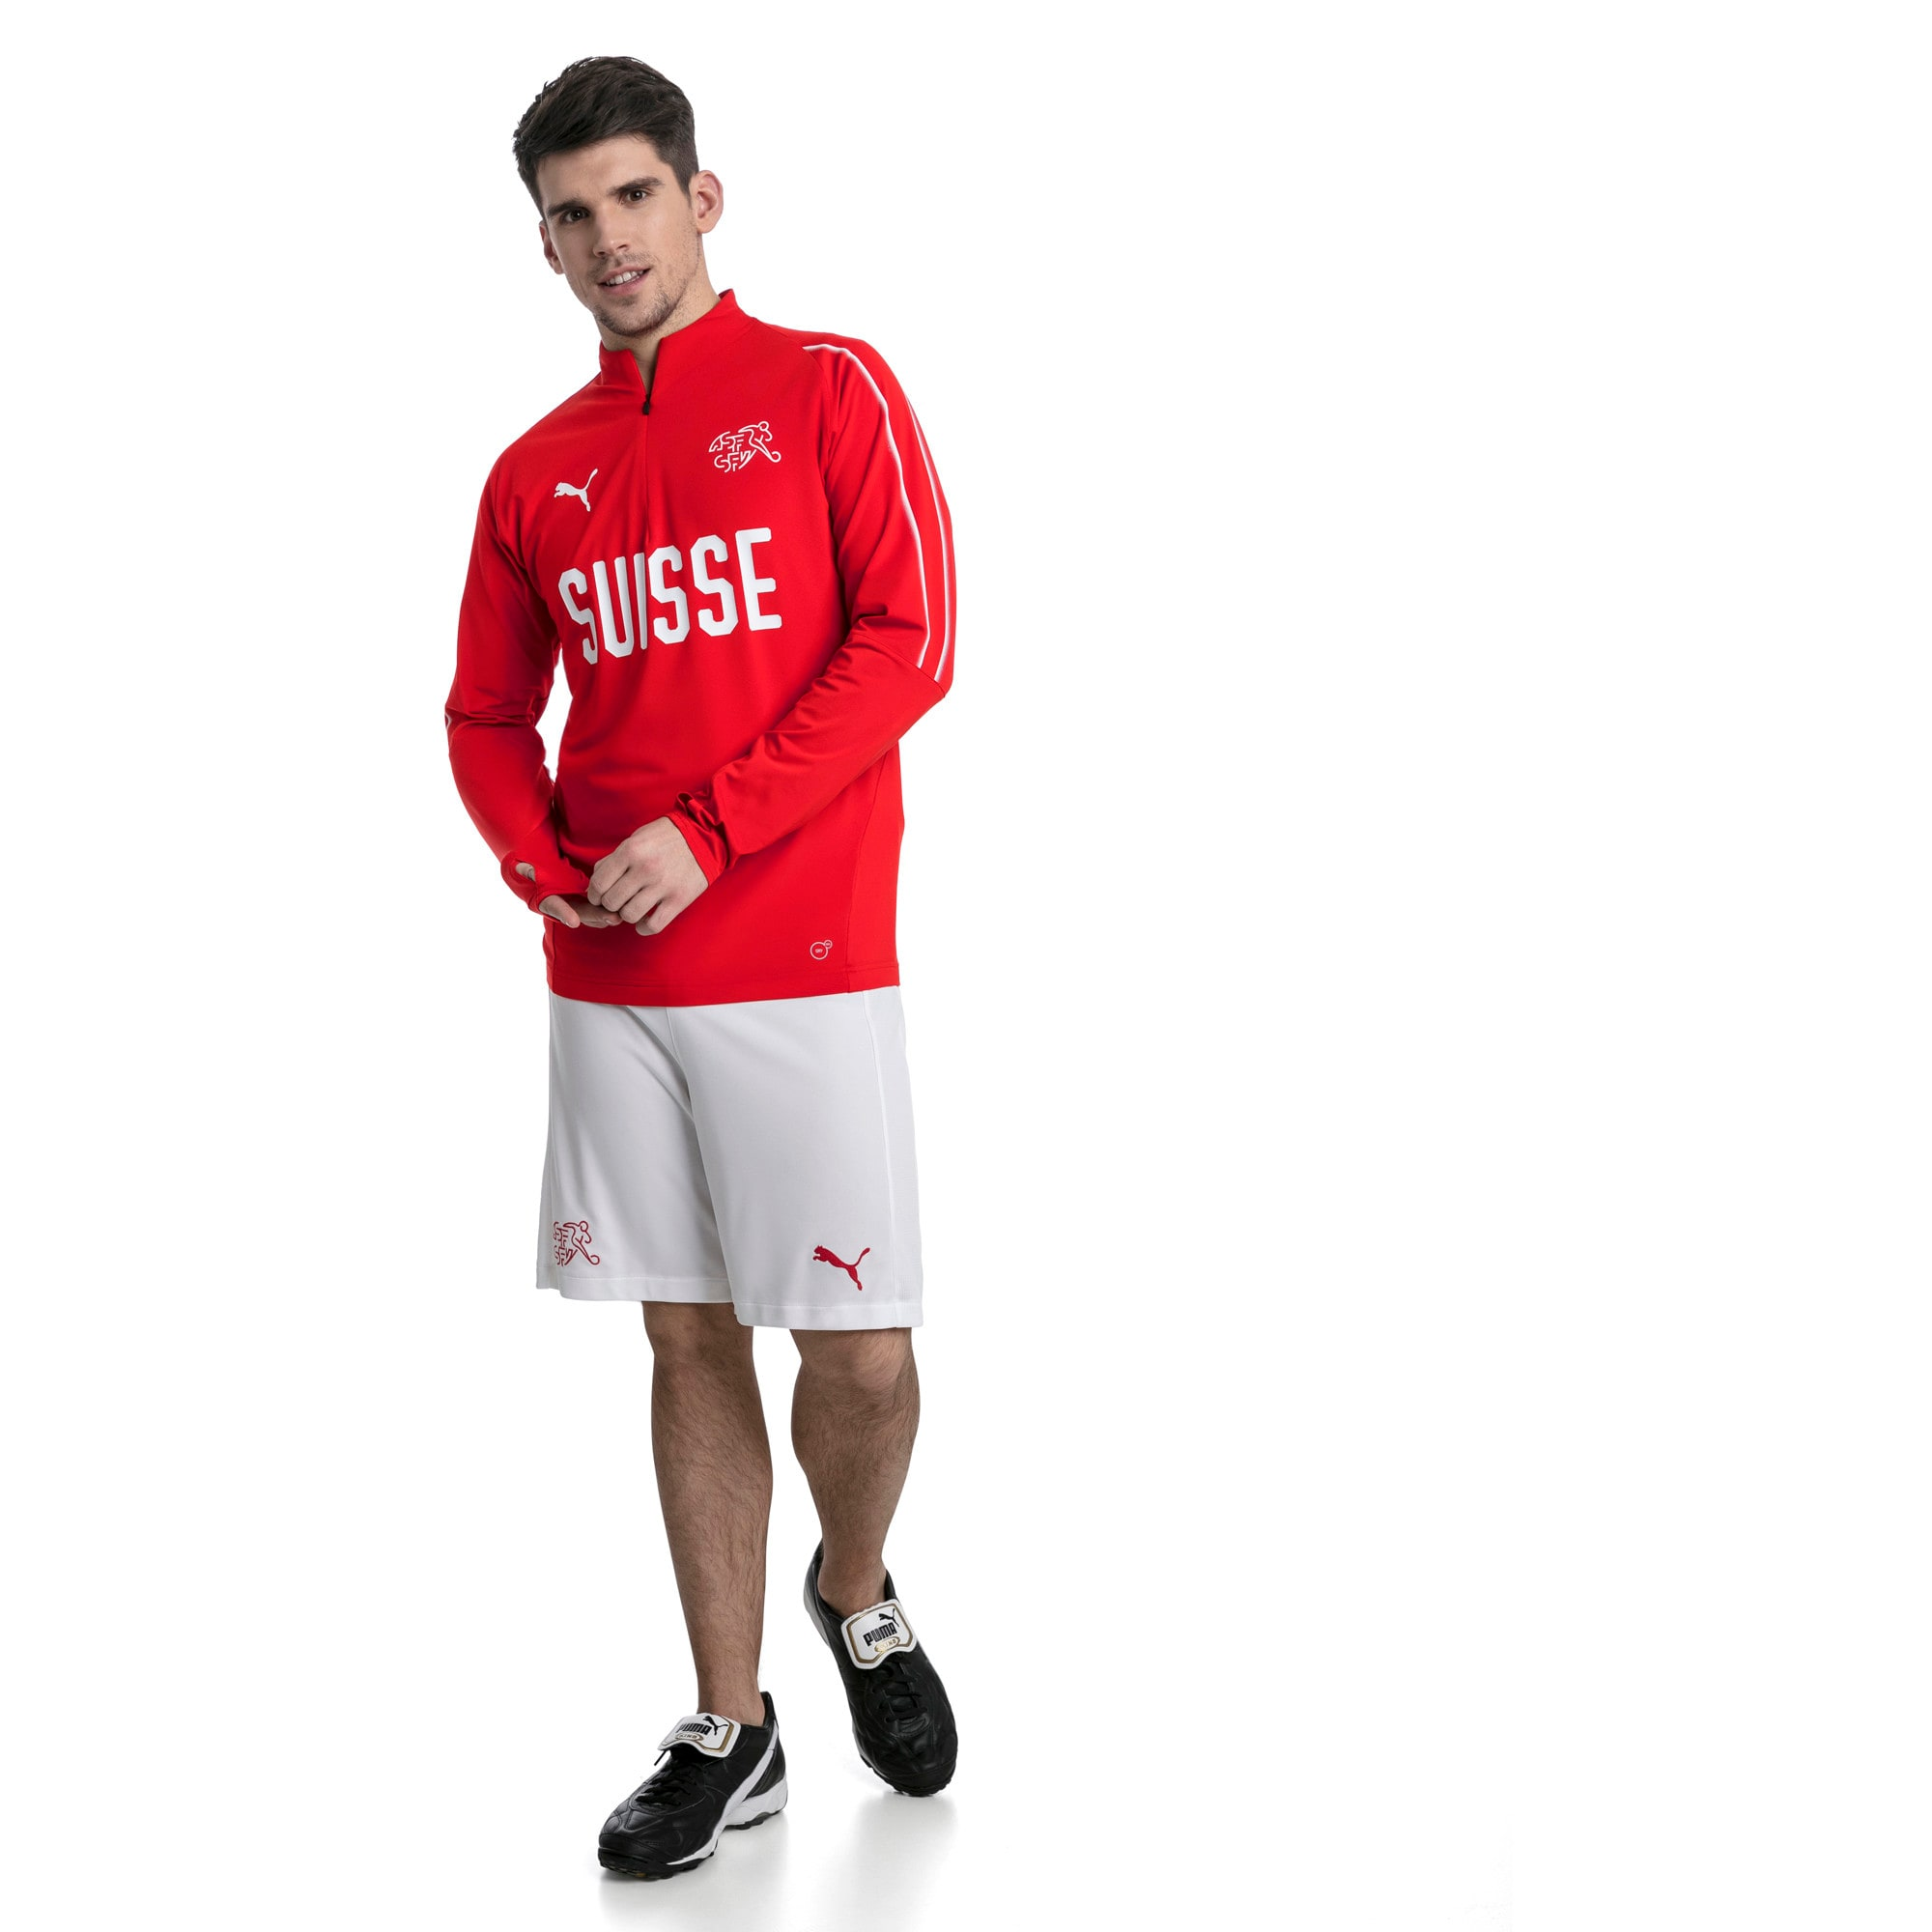 Thumbnail 5 of Trainingstop van Zwitserland met korte rits, Puma Red-Puma White, medium